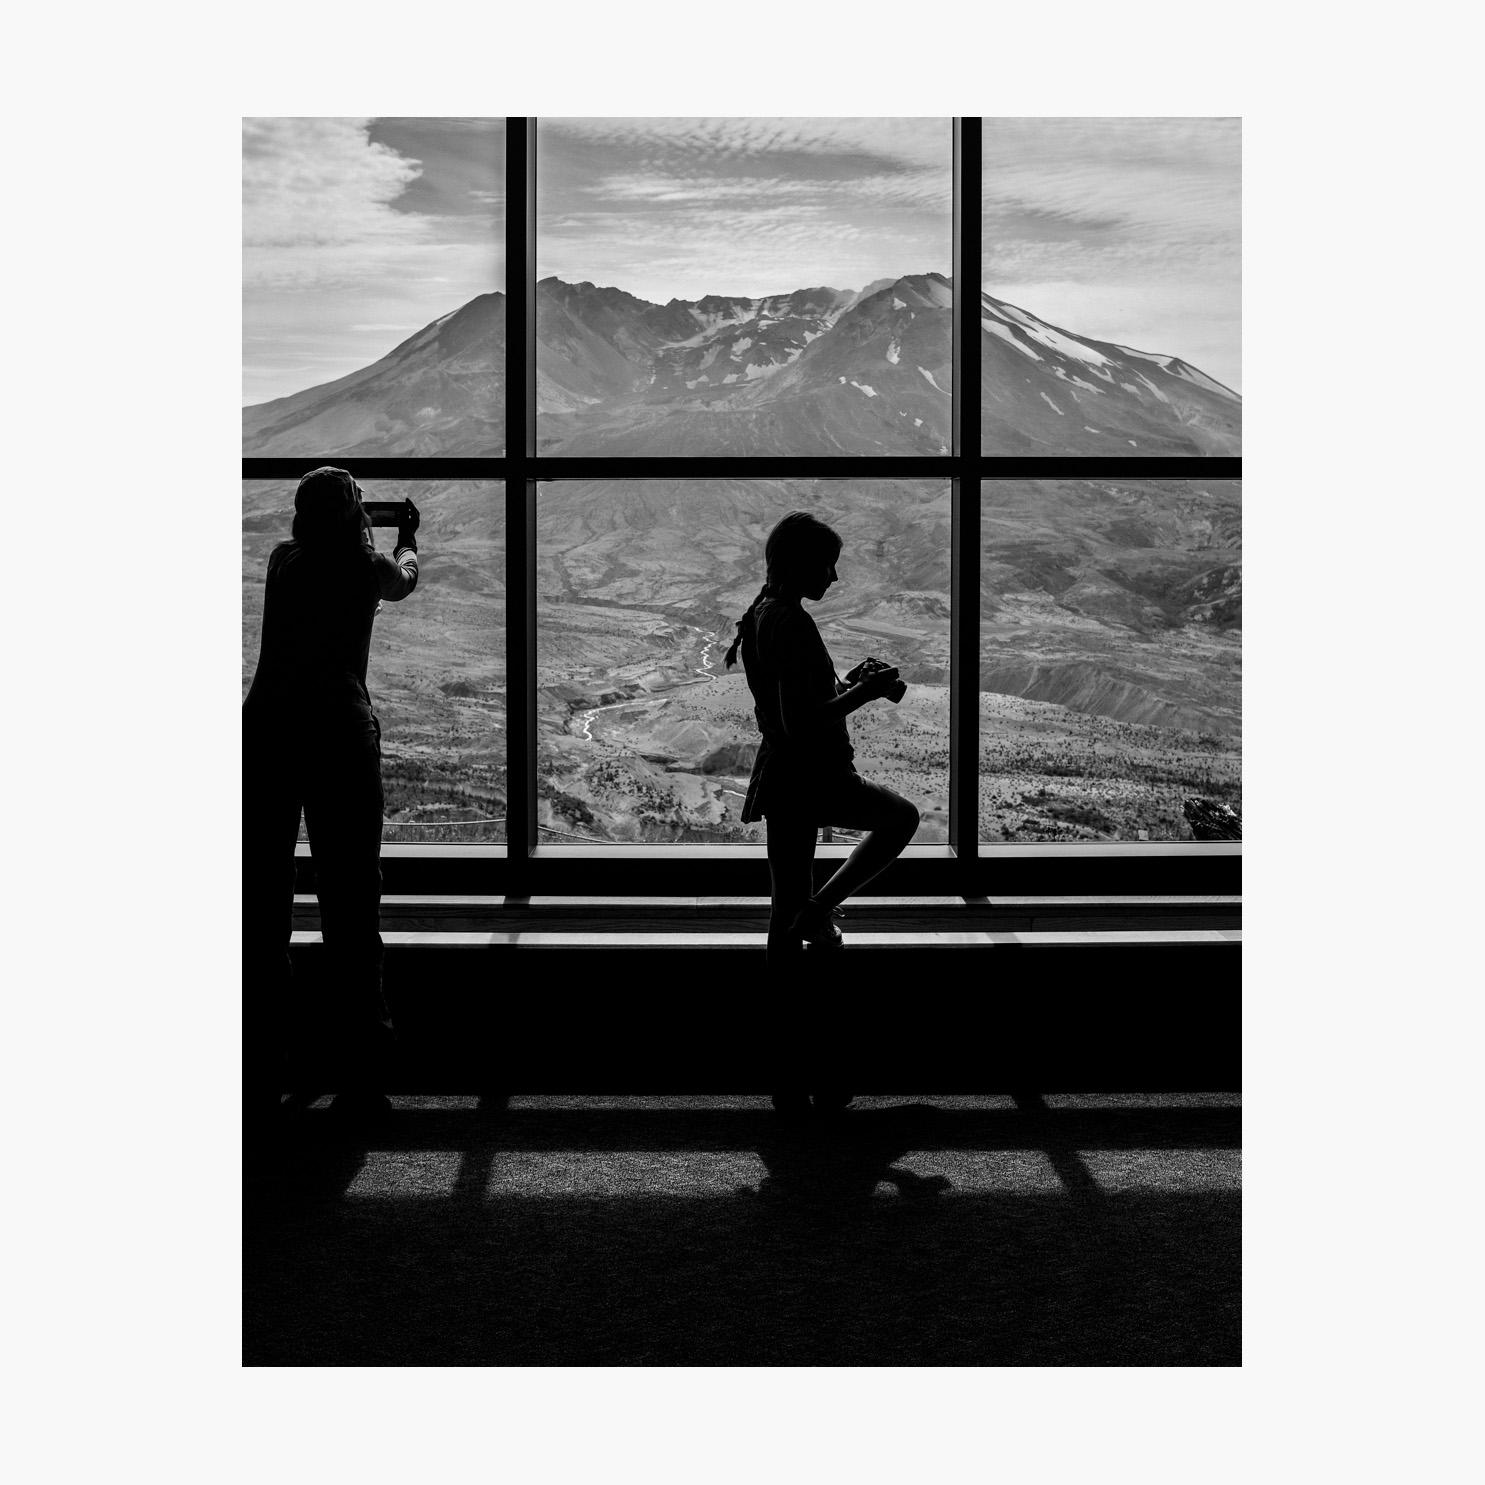 ©-Harry-W-Edmonds-2018-@photographersnote-Street-Sights-Social-PN11.jpg